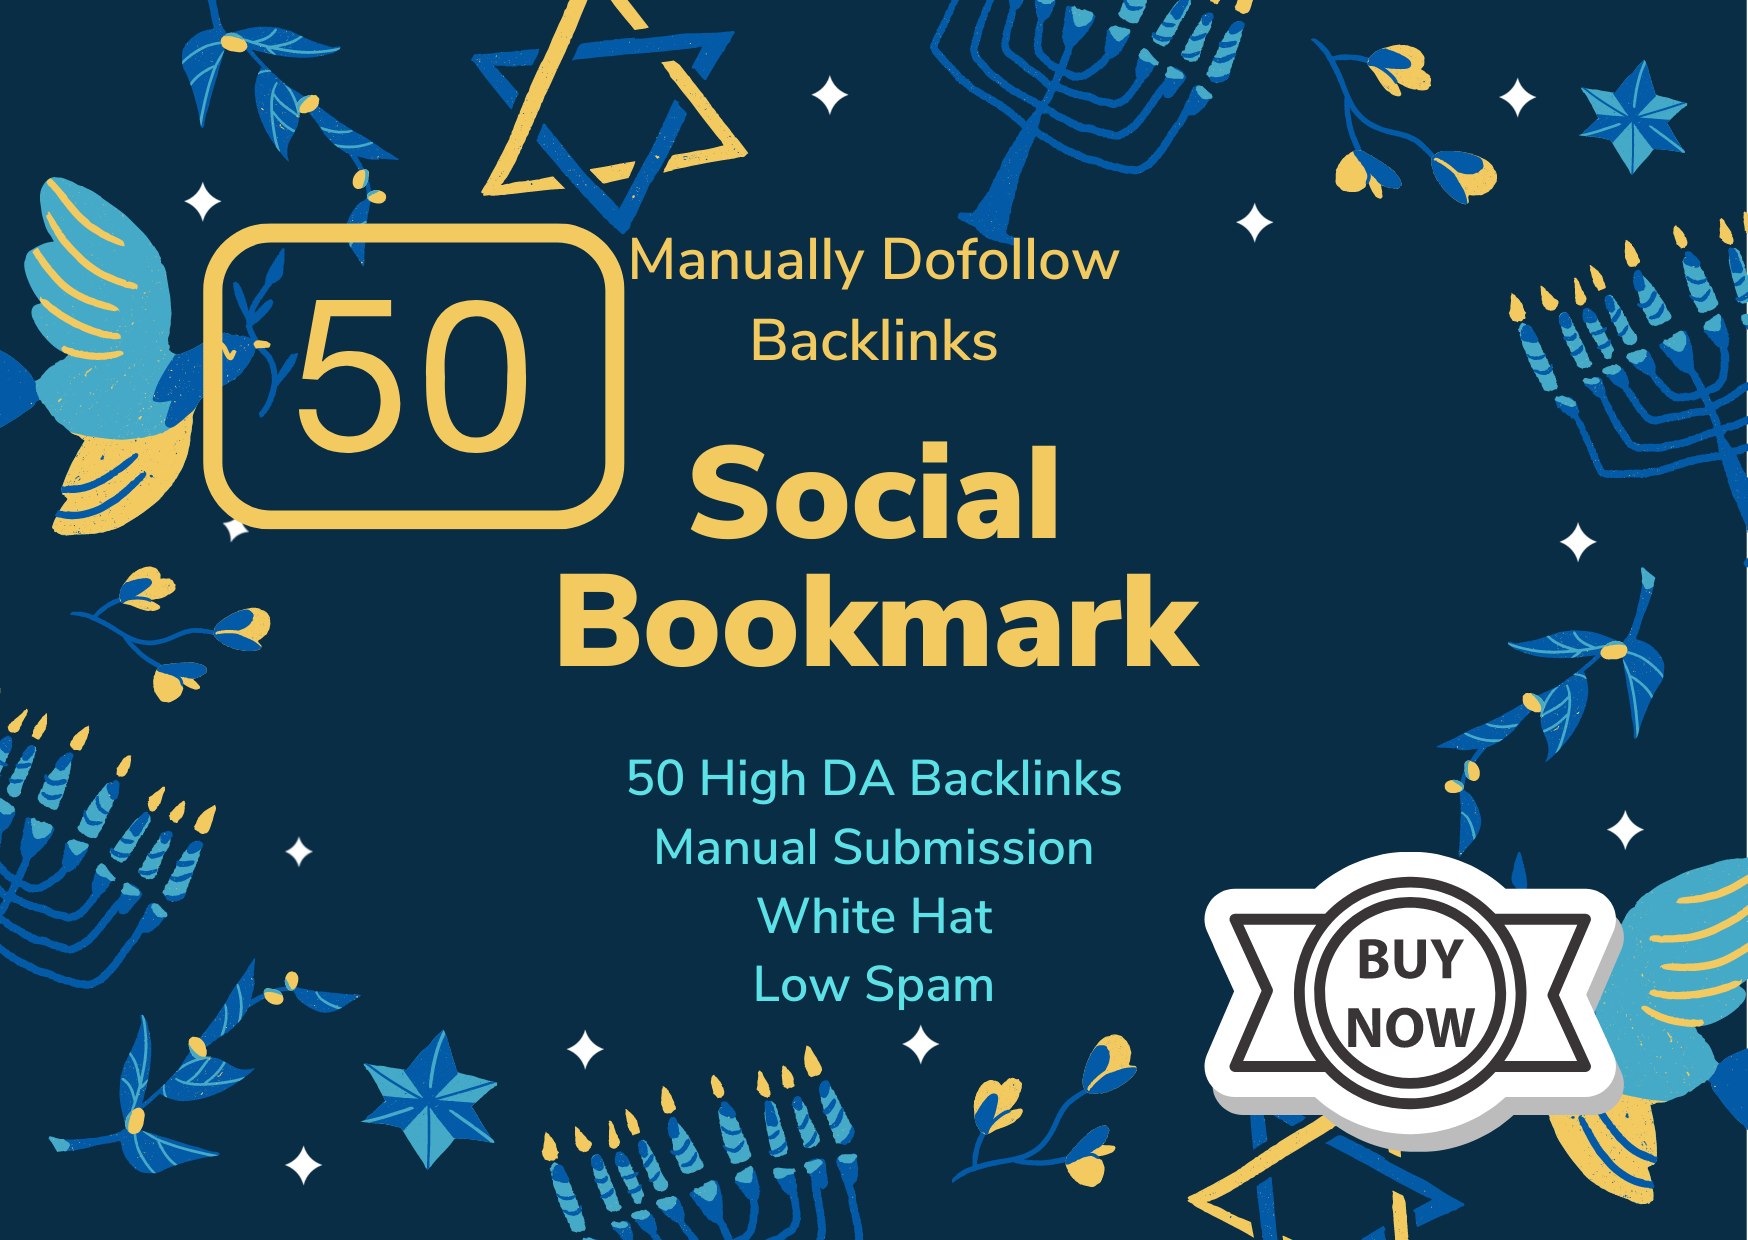 50 social bookmarking Dofollow Backlinks